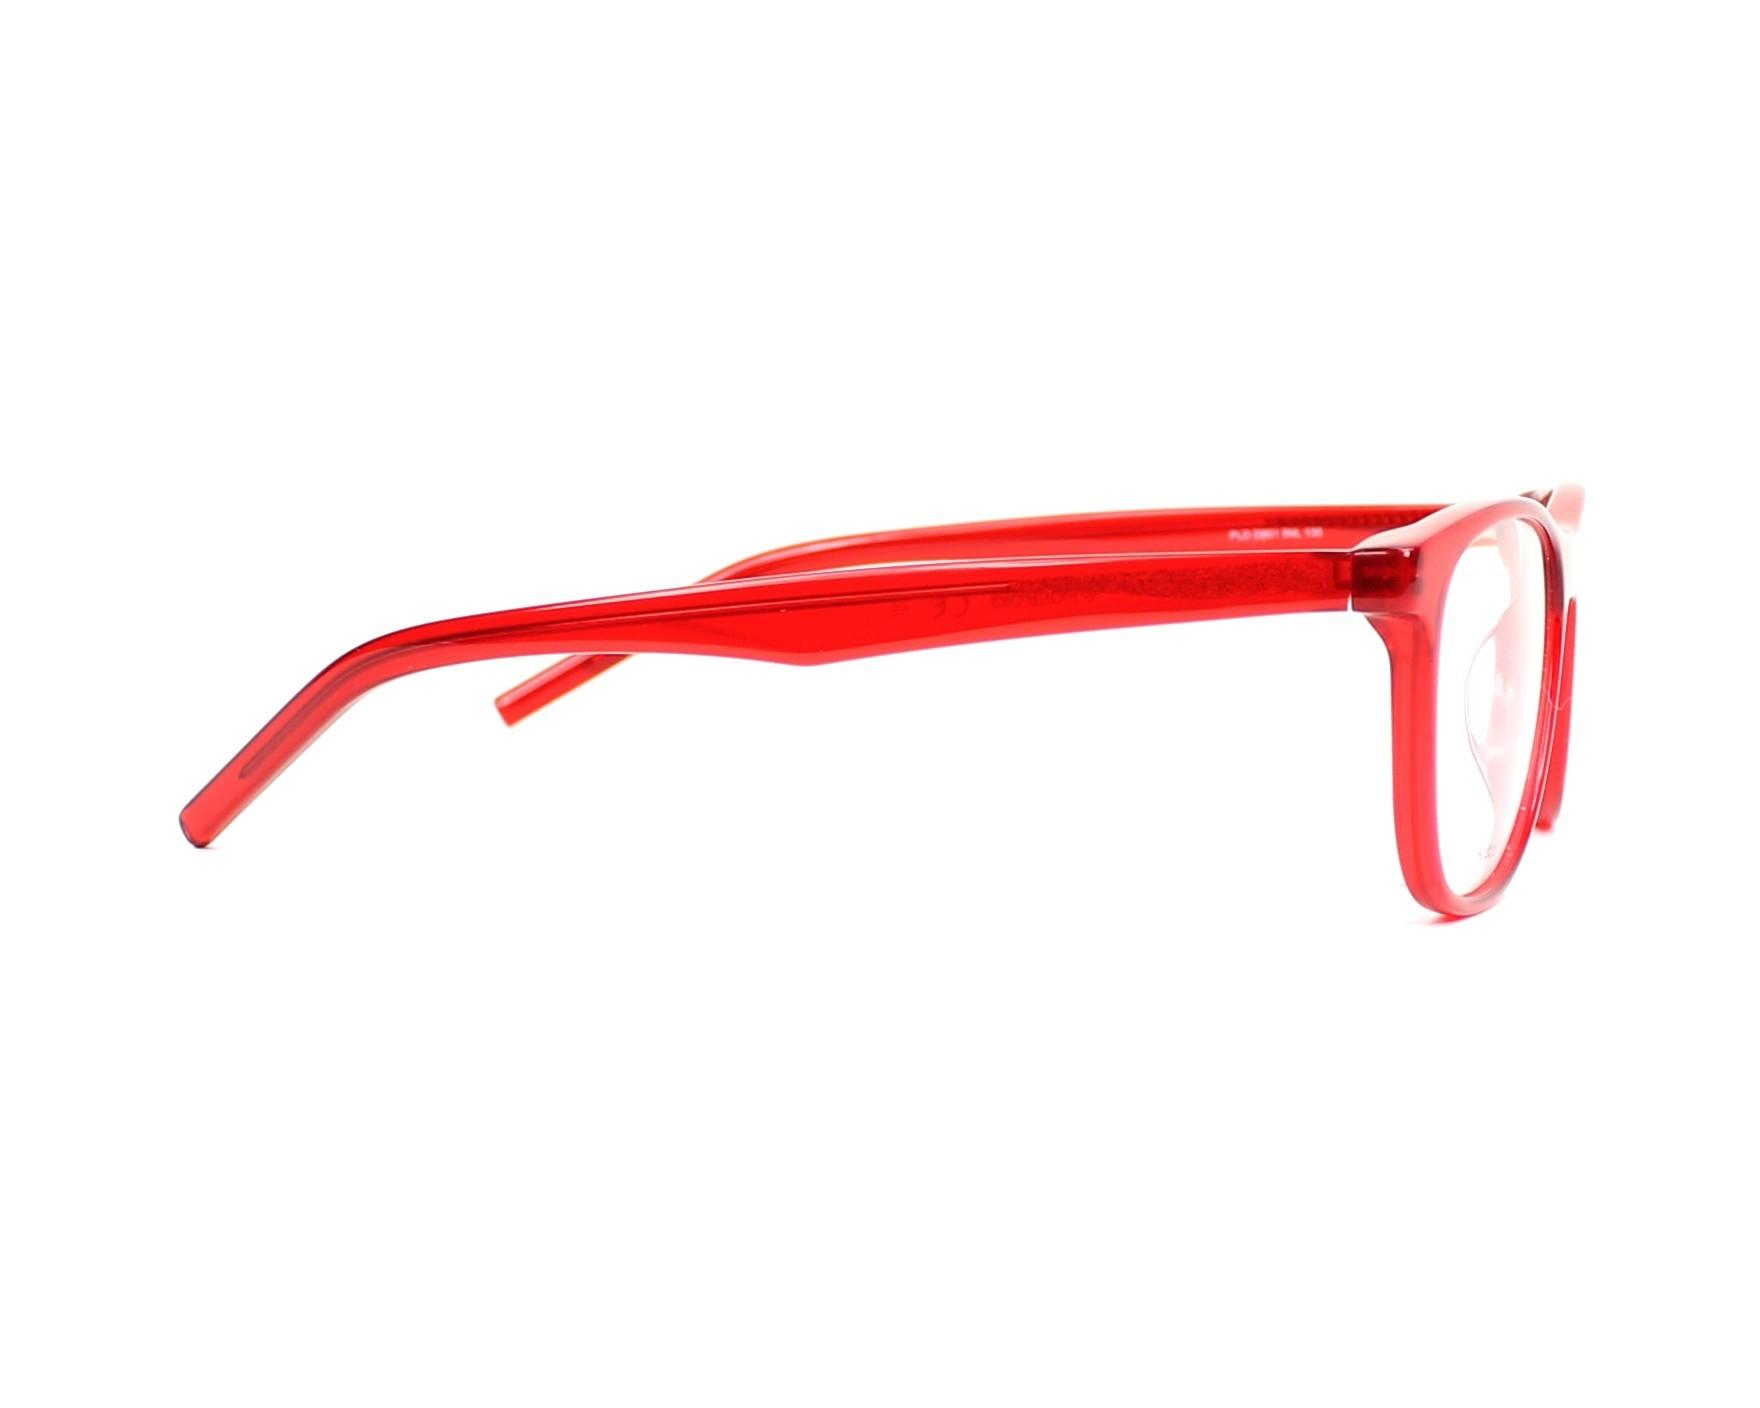 0d29ffc65d33 eyeglasses Polaroid PLDD-801 5NL 47-16 Red side view